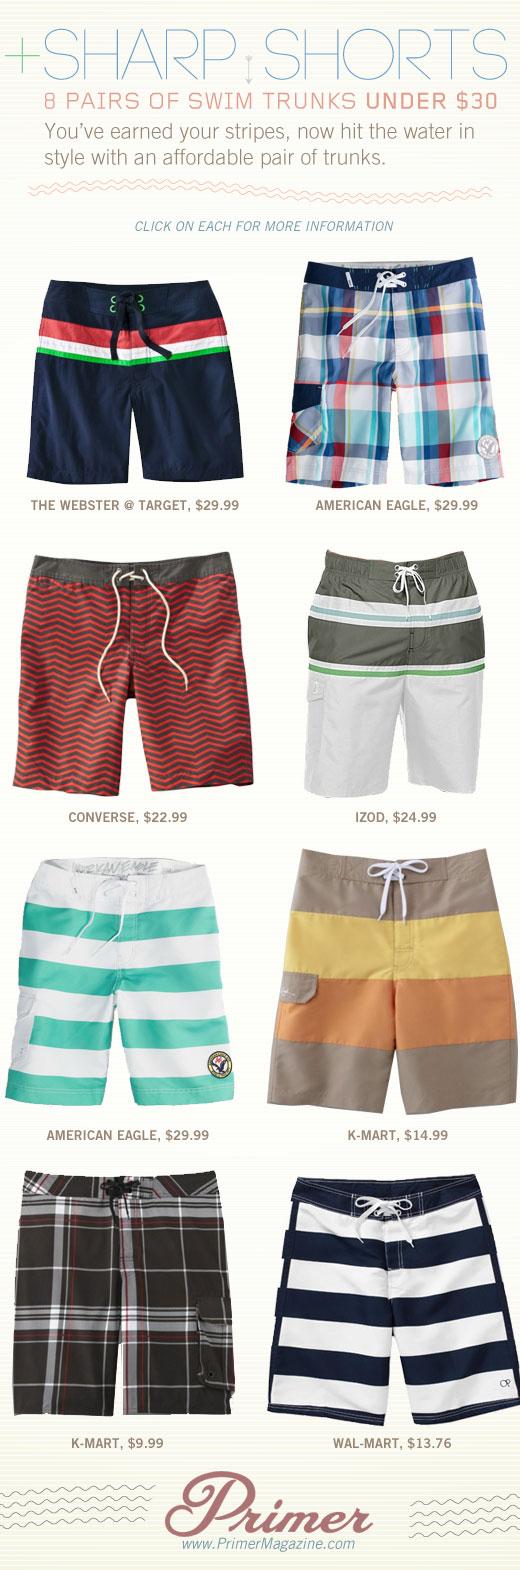 Collage of swim trunks